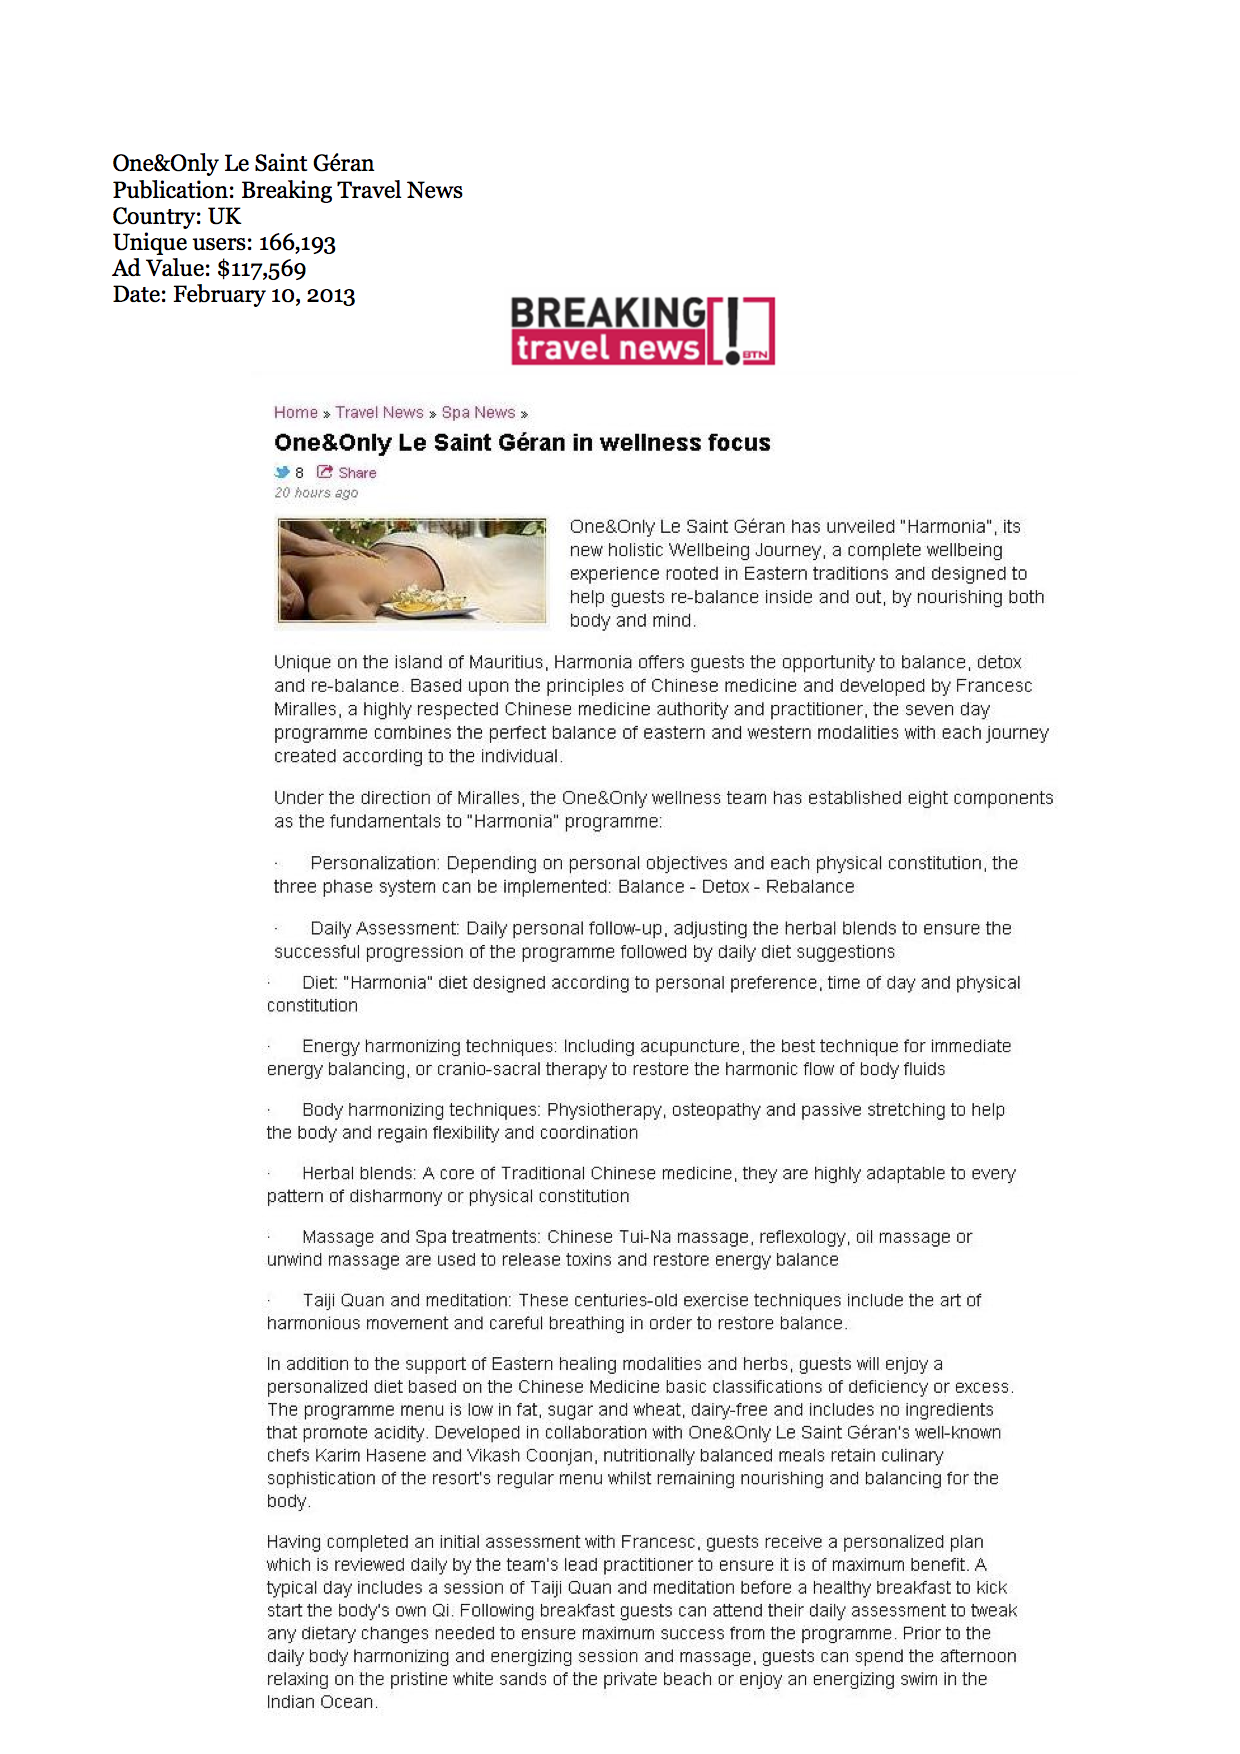 030 - Breaking Travel News 01.10.13